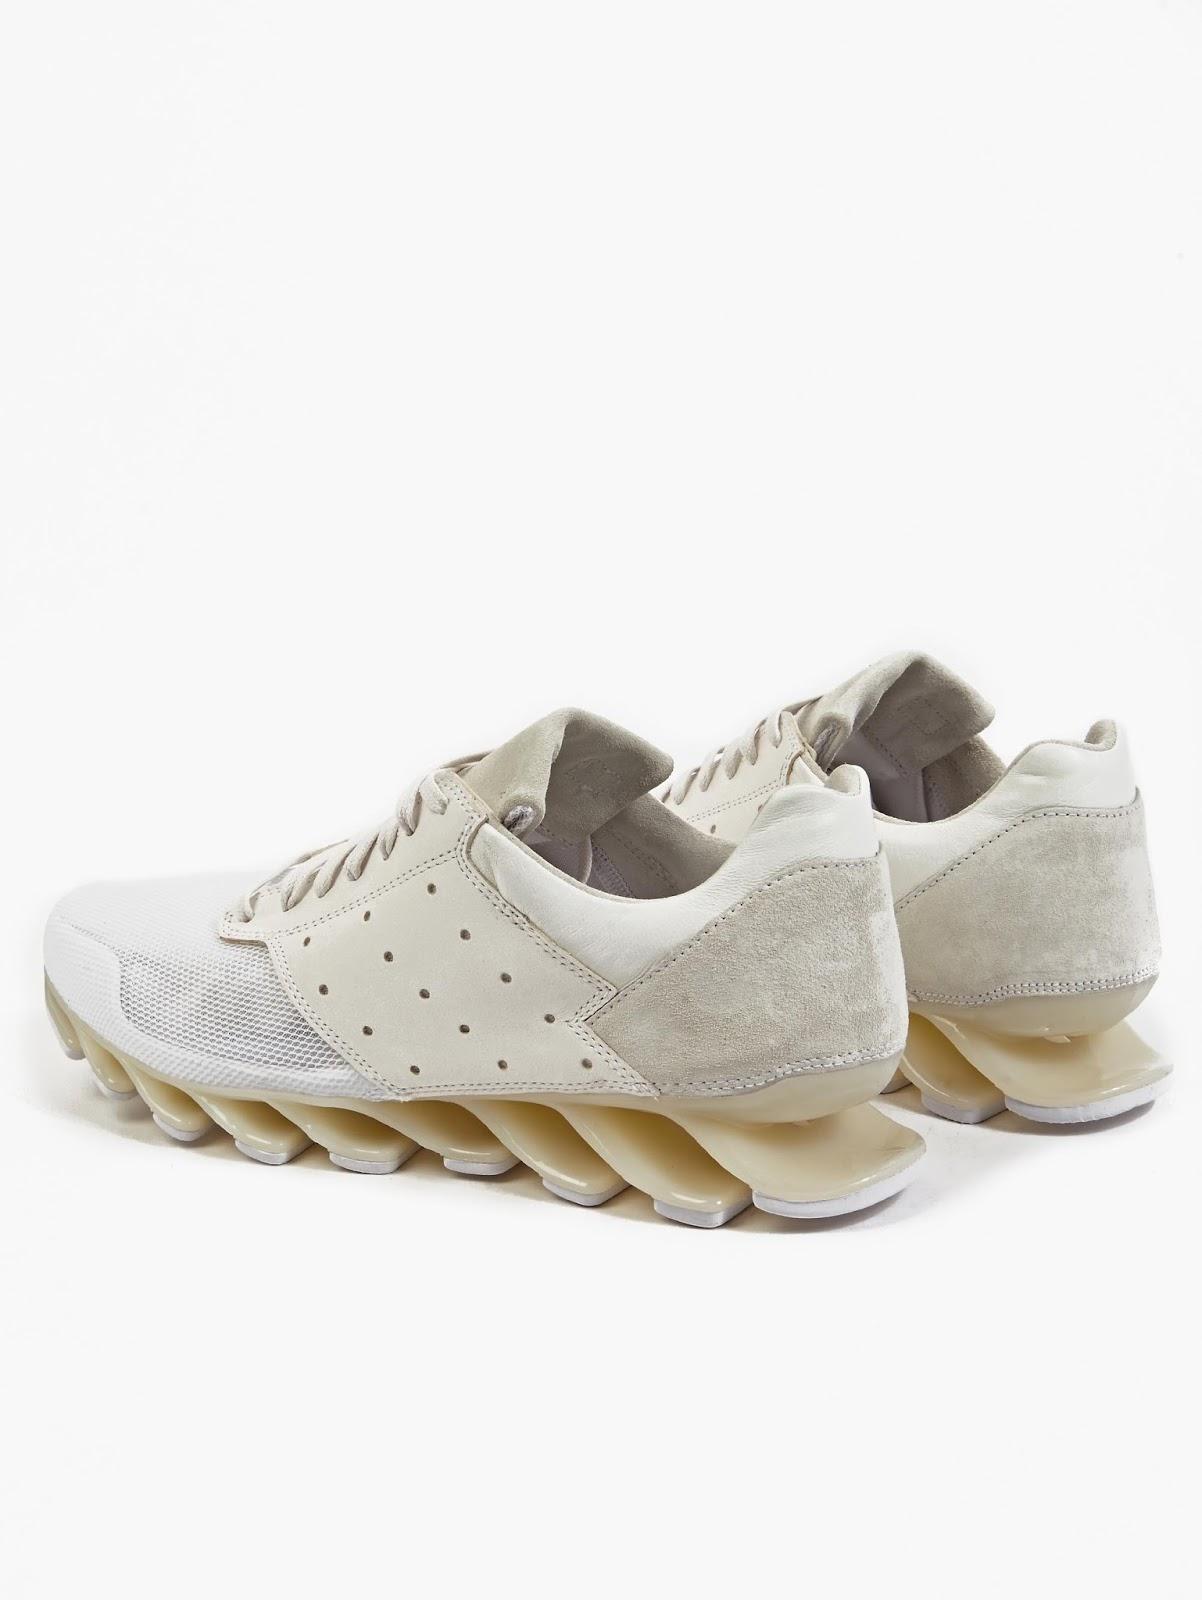 adidas-rick-owens-minimalist-edgy-sneakers6.jpg